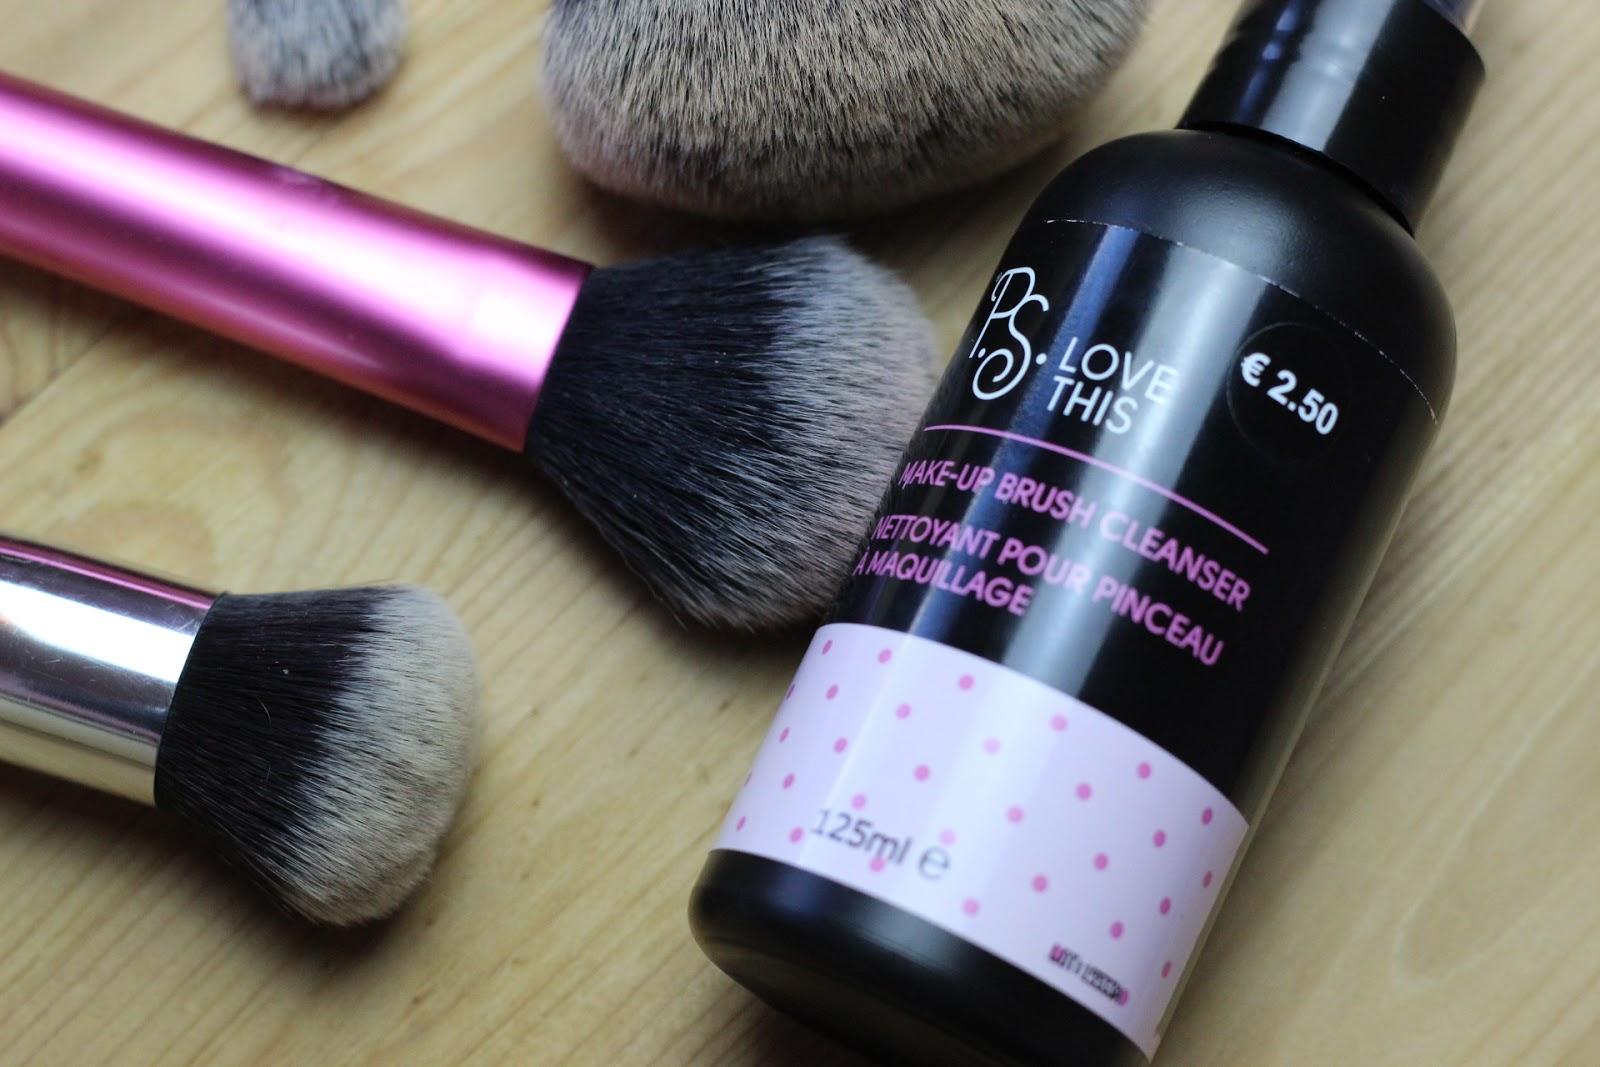 Primark Makeup Brush Cleaner